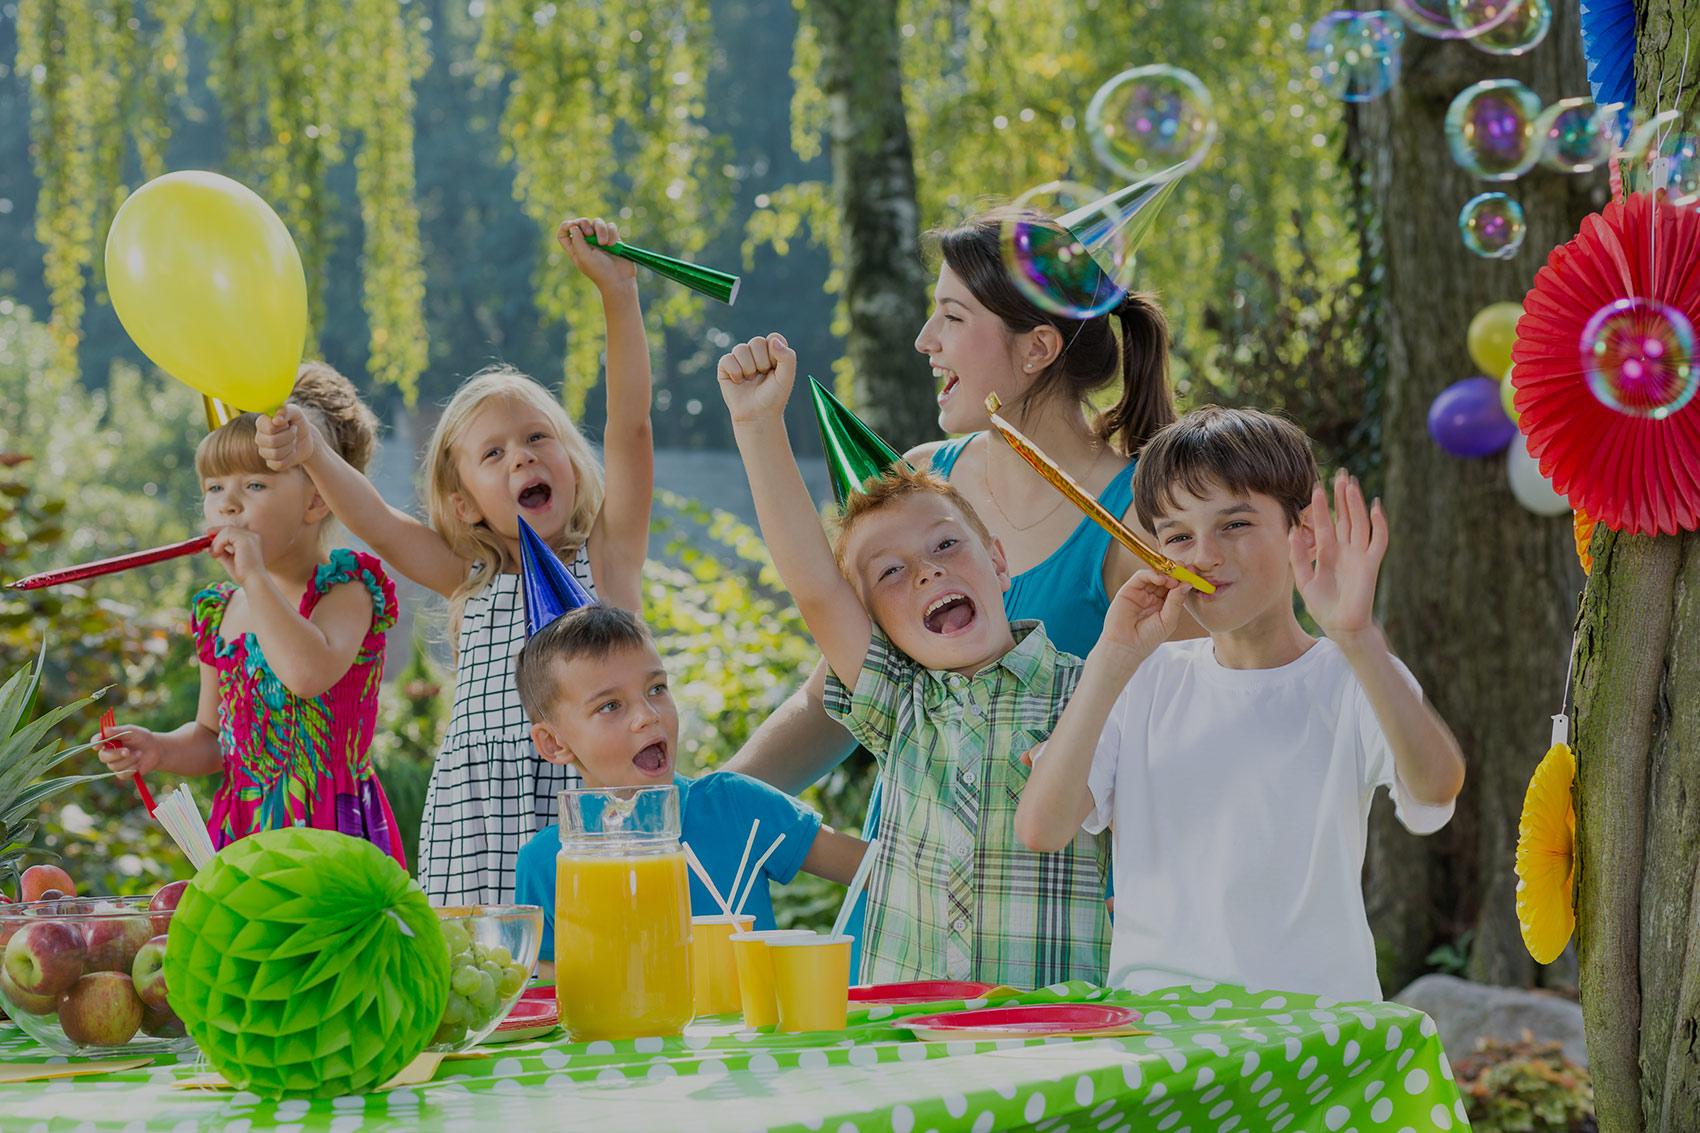 happy days events organisateur anniversaire enfants mulhouse strasbourg colmar haut rhin 68 et bas rhin 67 alsace